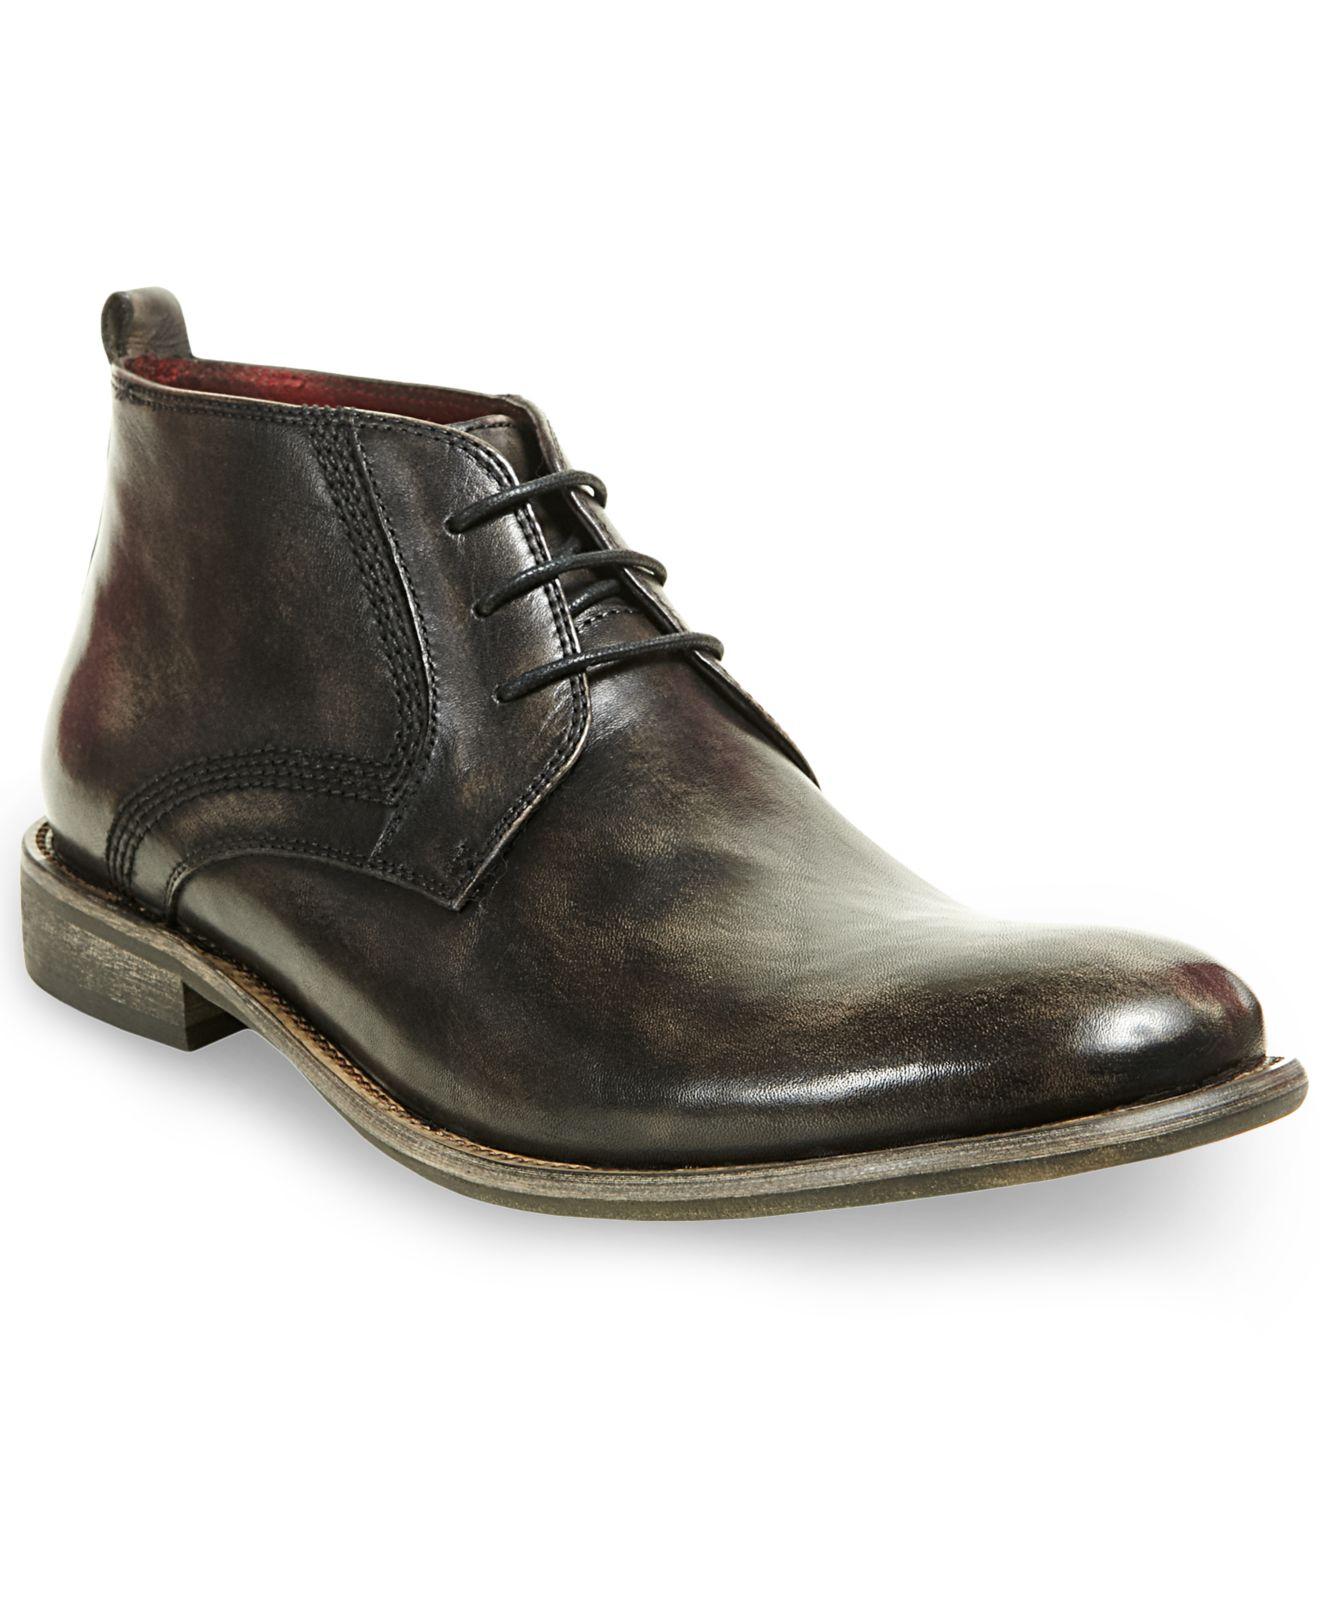 43b8dcc3200 Steve Madden Black Bronxxx Chukka Boots for men